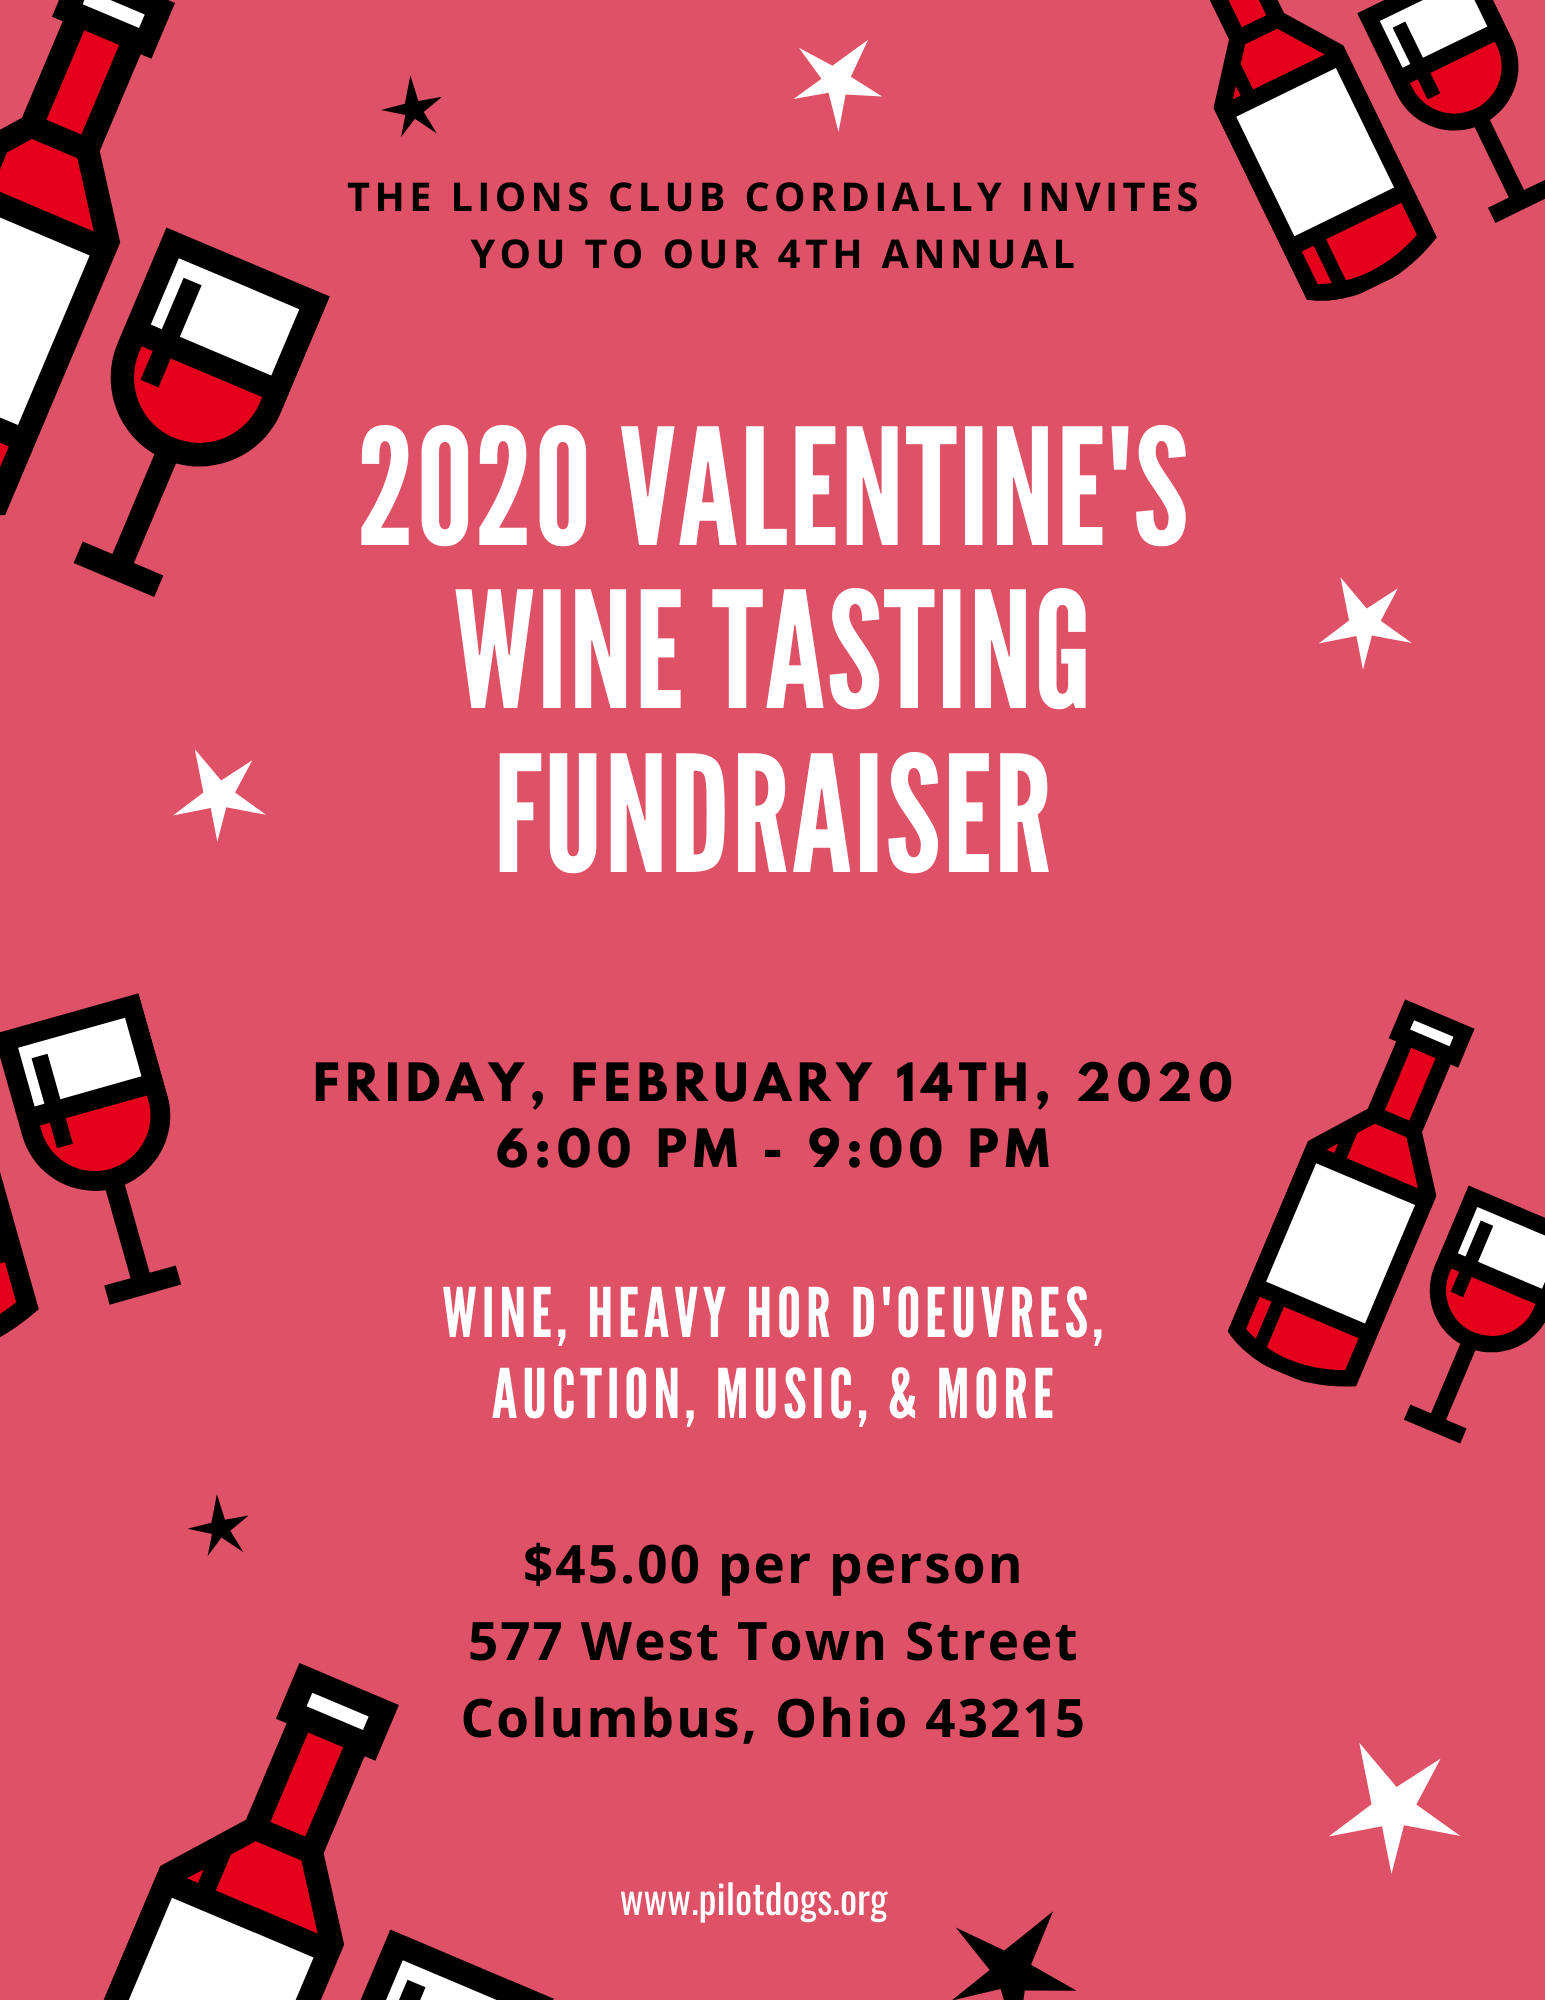 2020 Valentine's Wine & Beer Tasting fundraiser